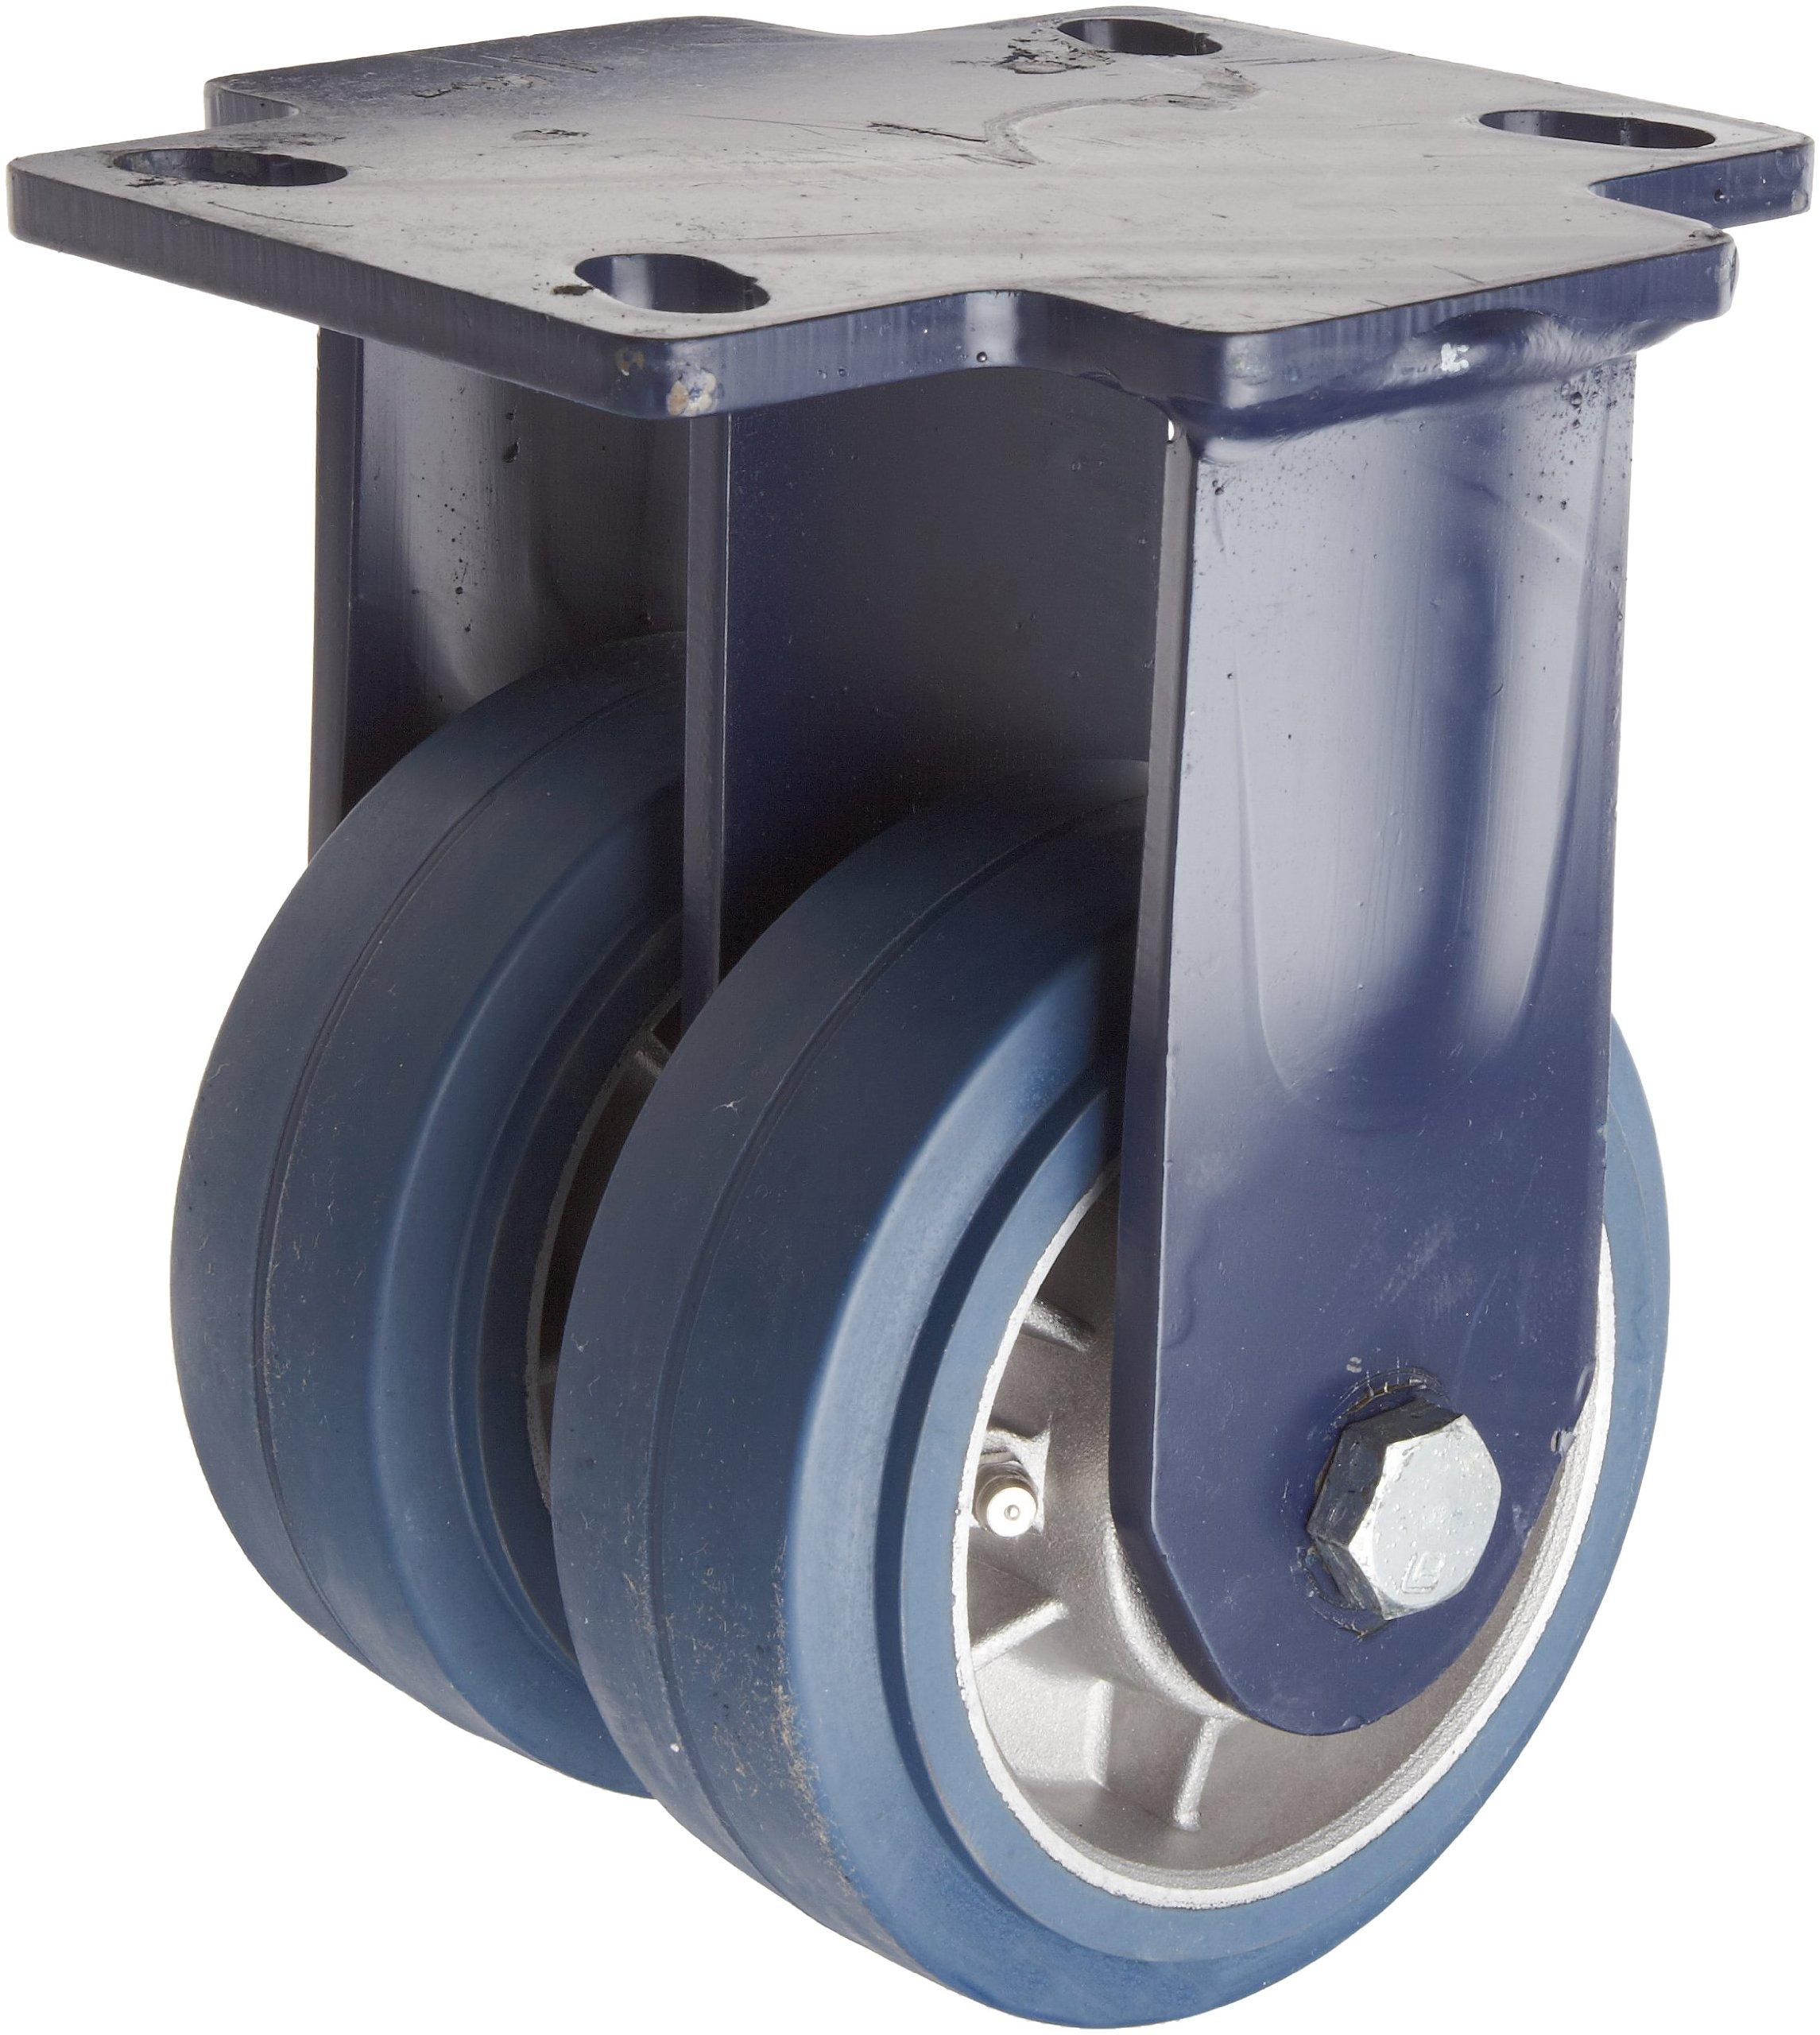 RWM Casters 2-75 Series Plate Caster, Rigid, Dual Wheel, Kingpinless, Rubber on Aluminum Wheel, Ball Bearing, 1600 lbs Capacity, 5'' Wheel Dia, 2'' Wheel Width, 7-1/2'' Mount Height, 6-1/2'' Plate Length, 4-1/2'' Plate Width